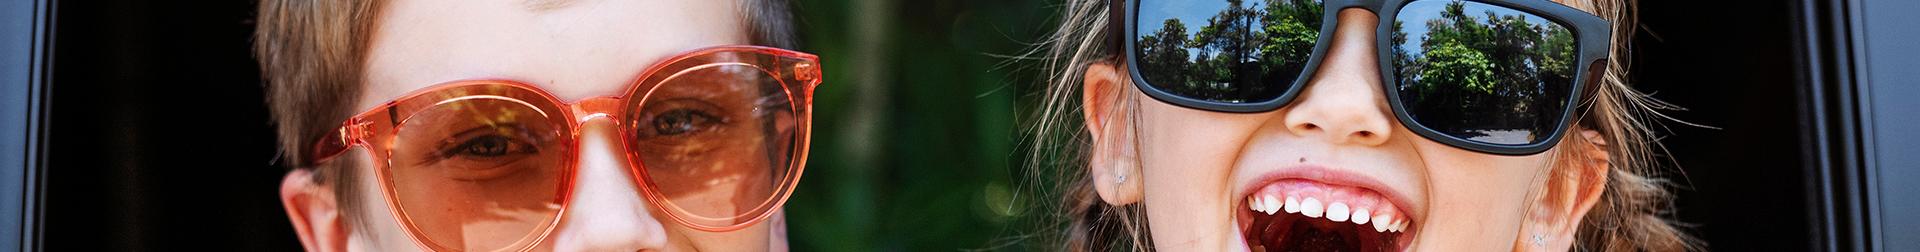 Sunglasses | Sunglasses - Buy Best Stylish Sunglasses for Kids | AromaCraze